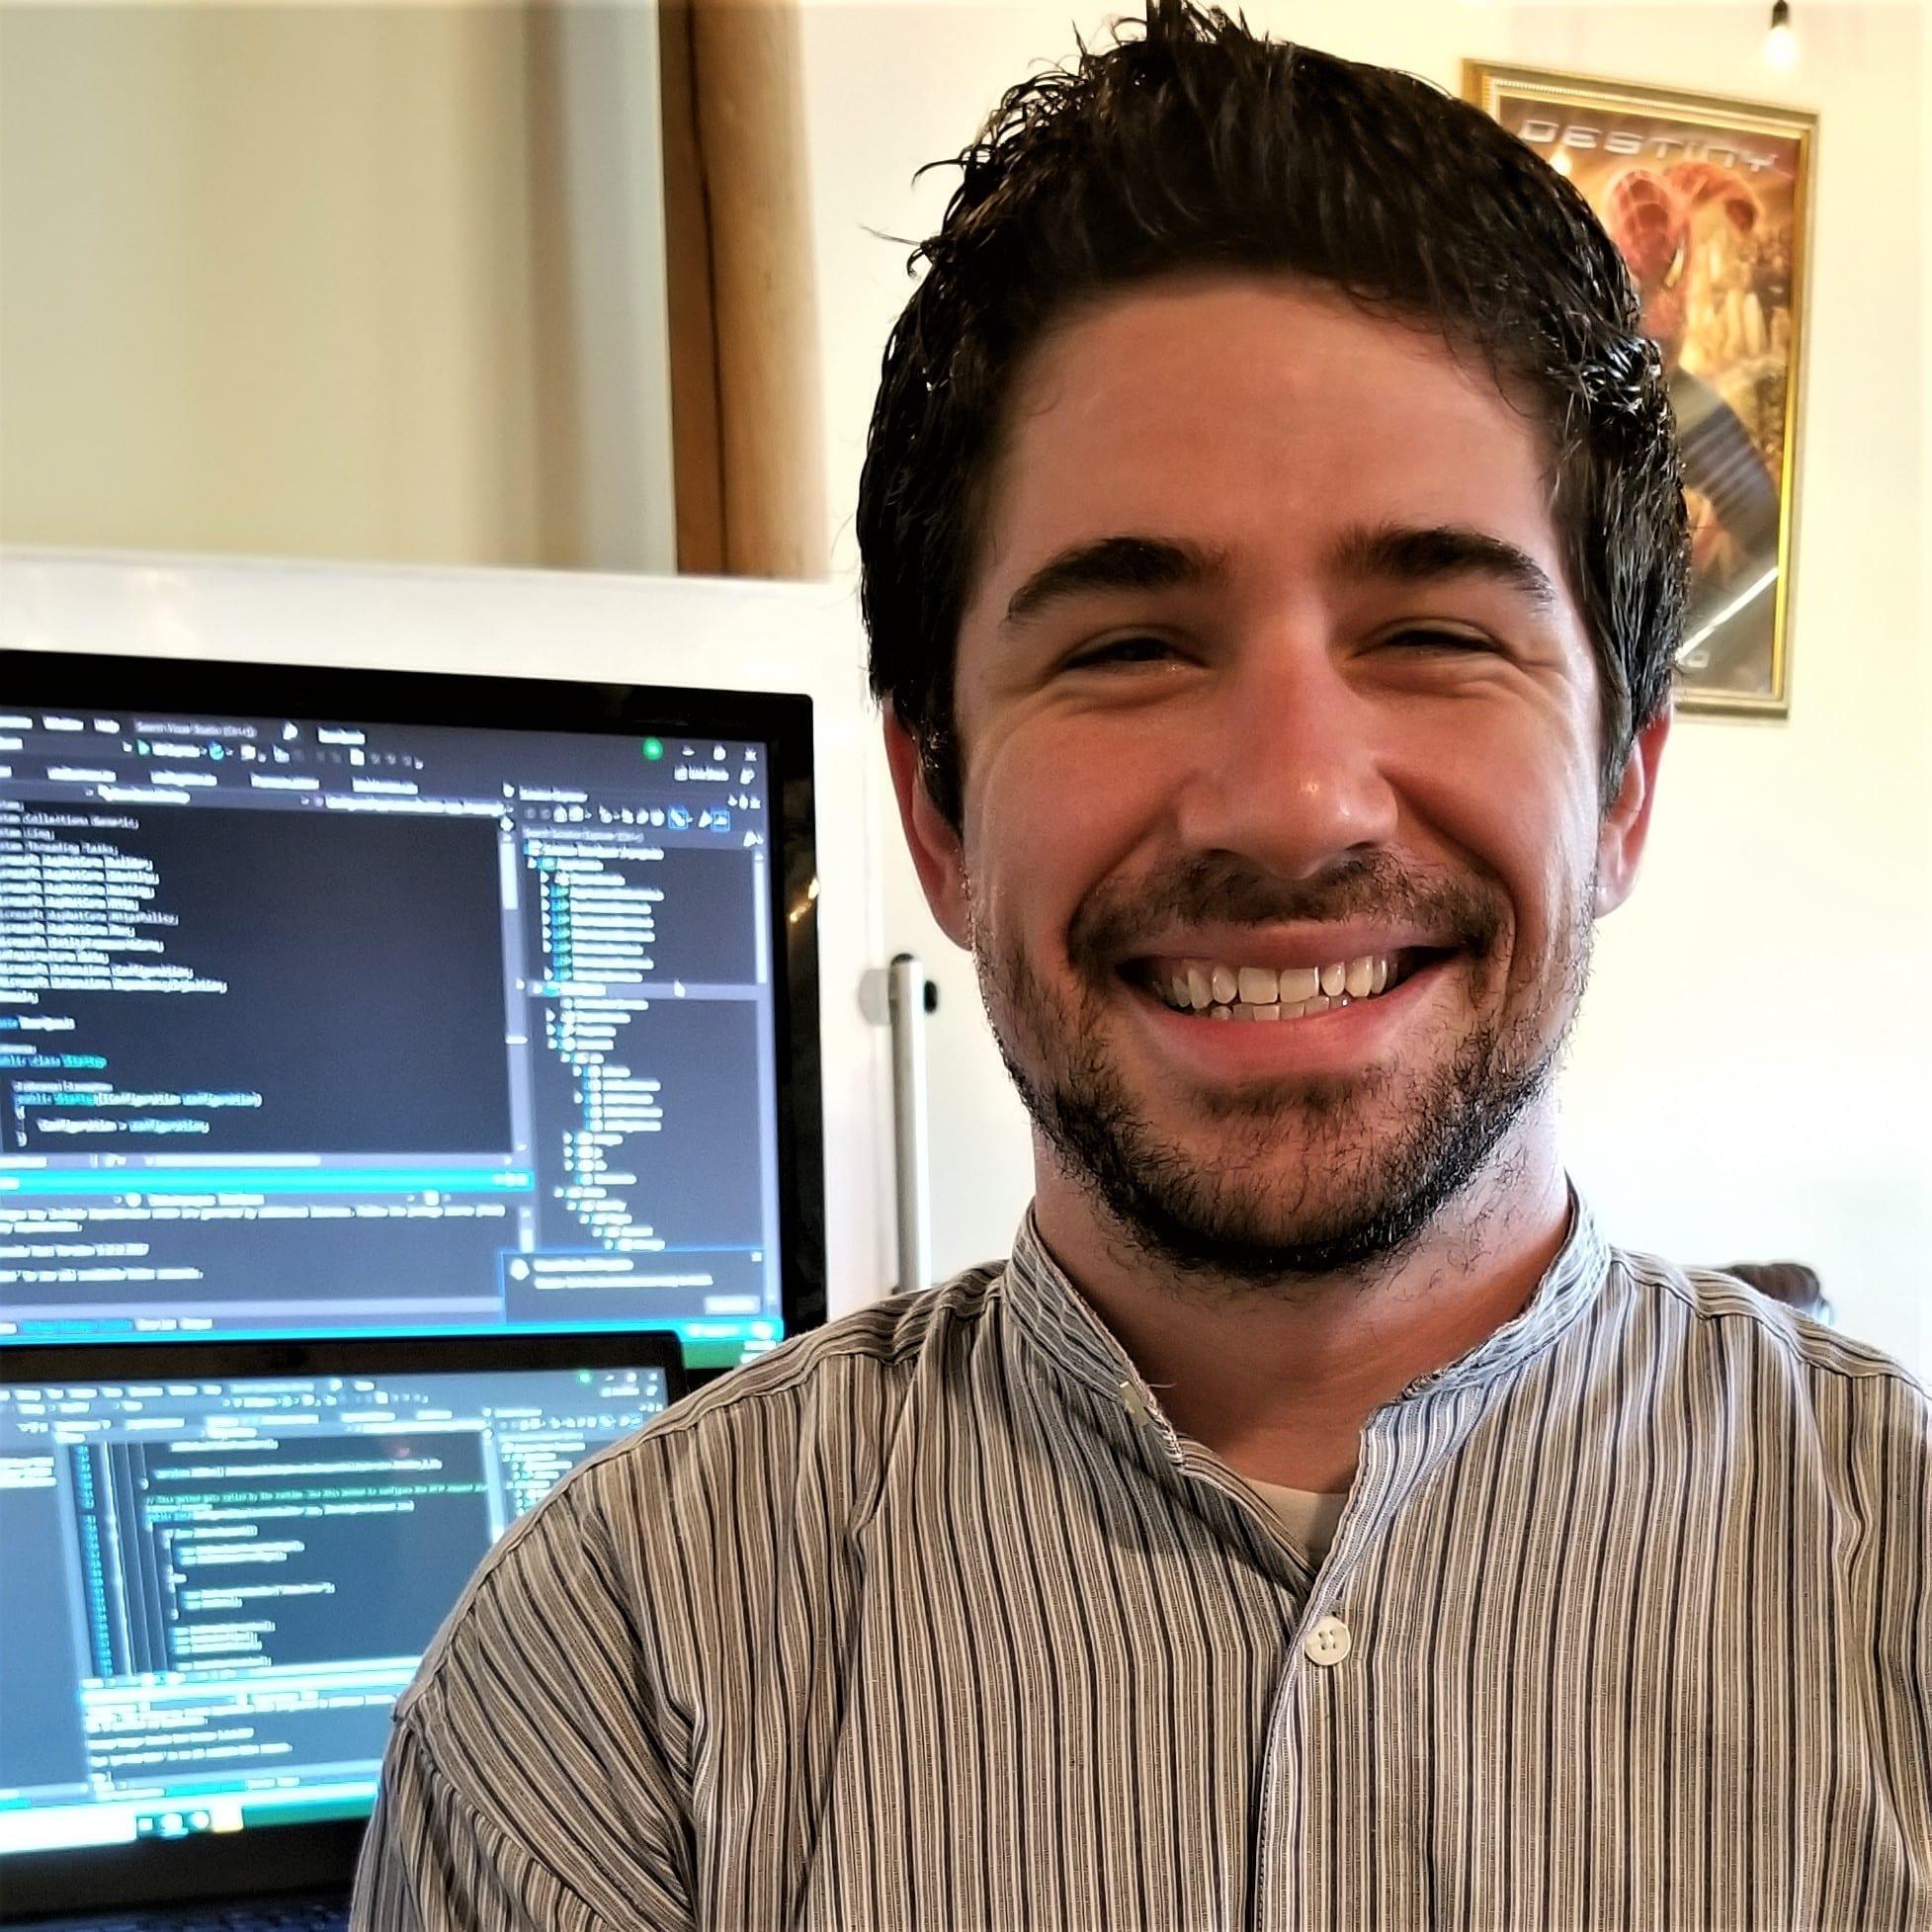 devCodeCamp Alumni Shawn Smidt